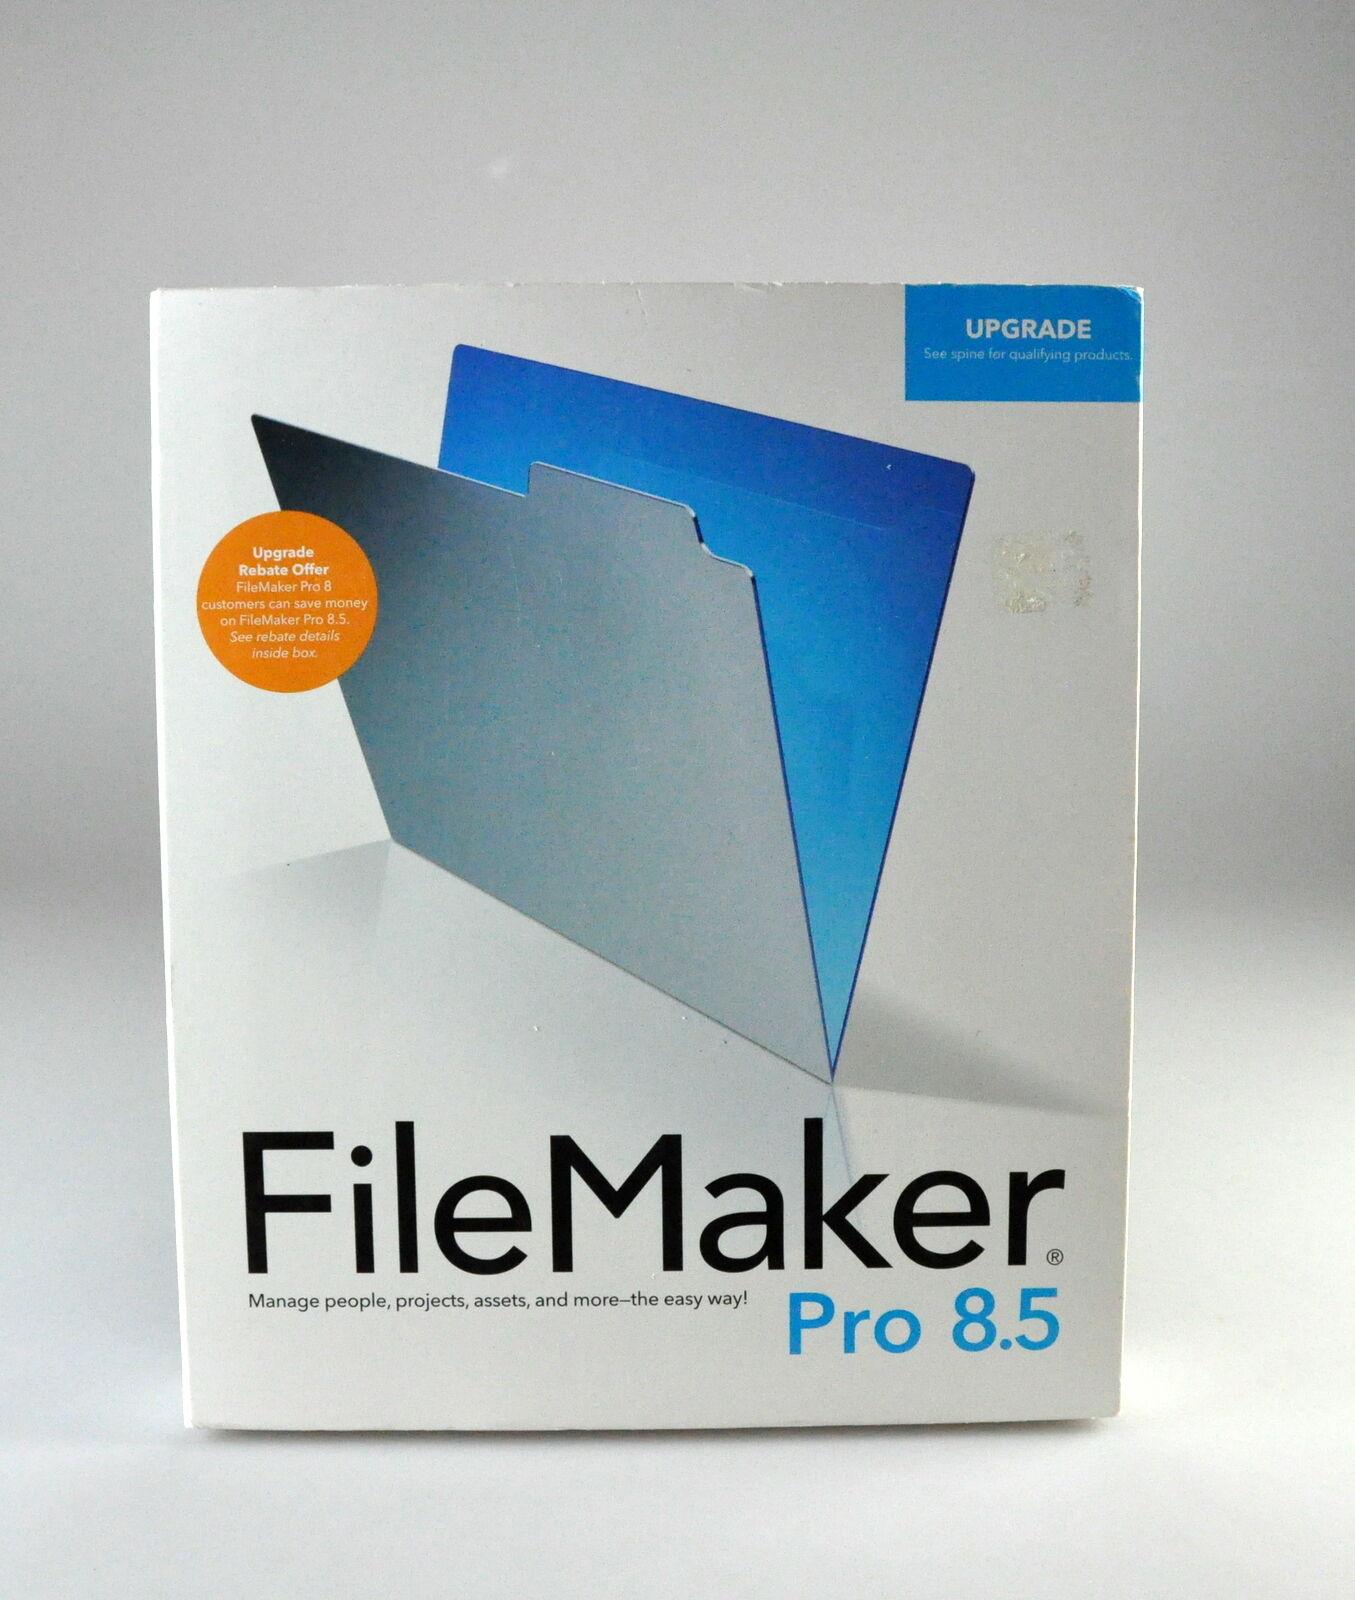 Filemaker pro 13 retail box french